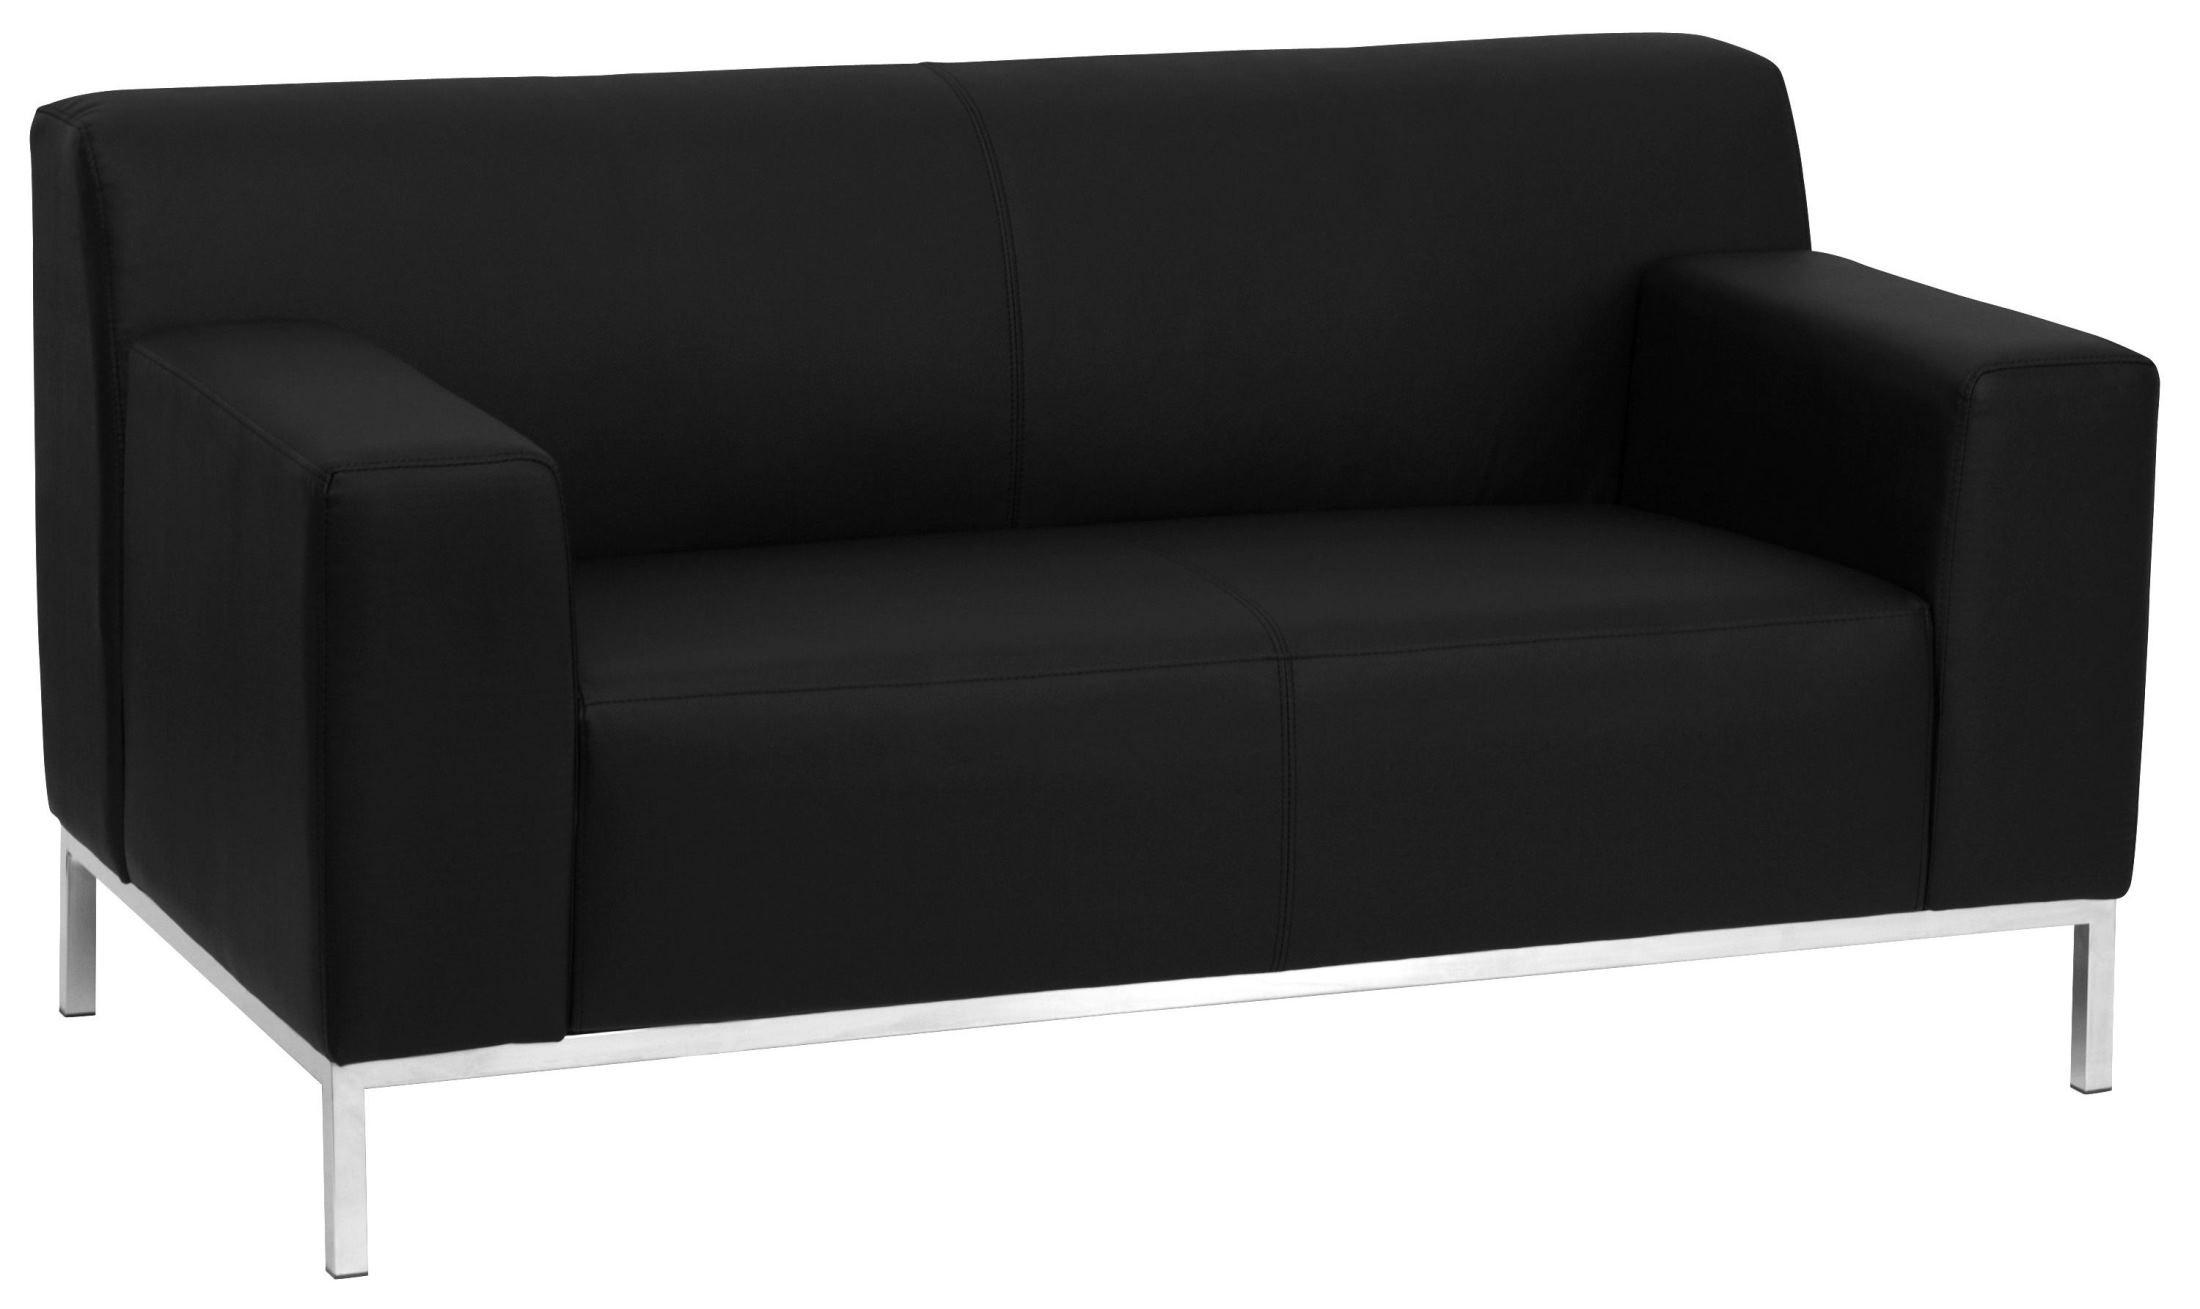 Hercules Definity Series Black Leather Loveseat From Renegade Coleman Furniture